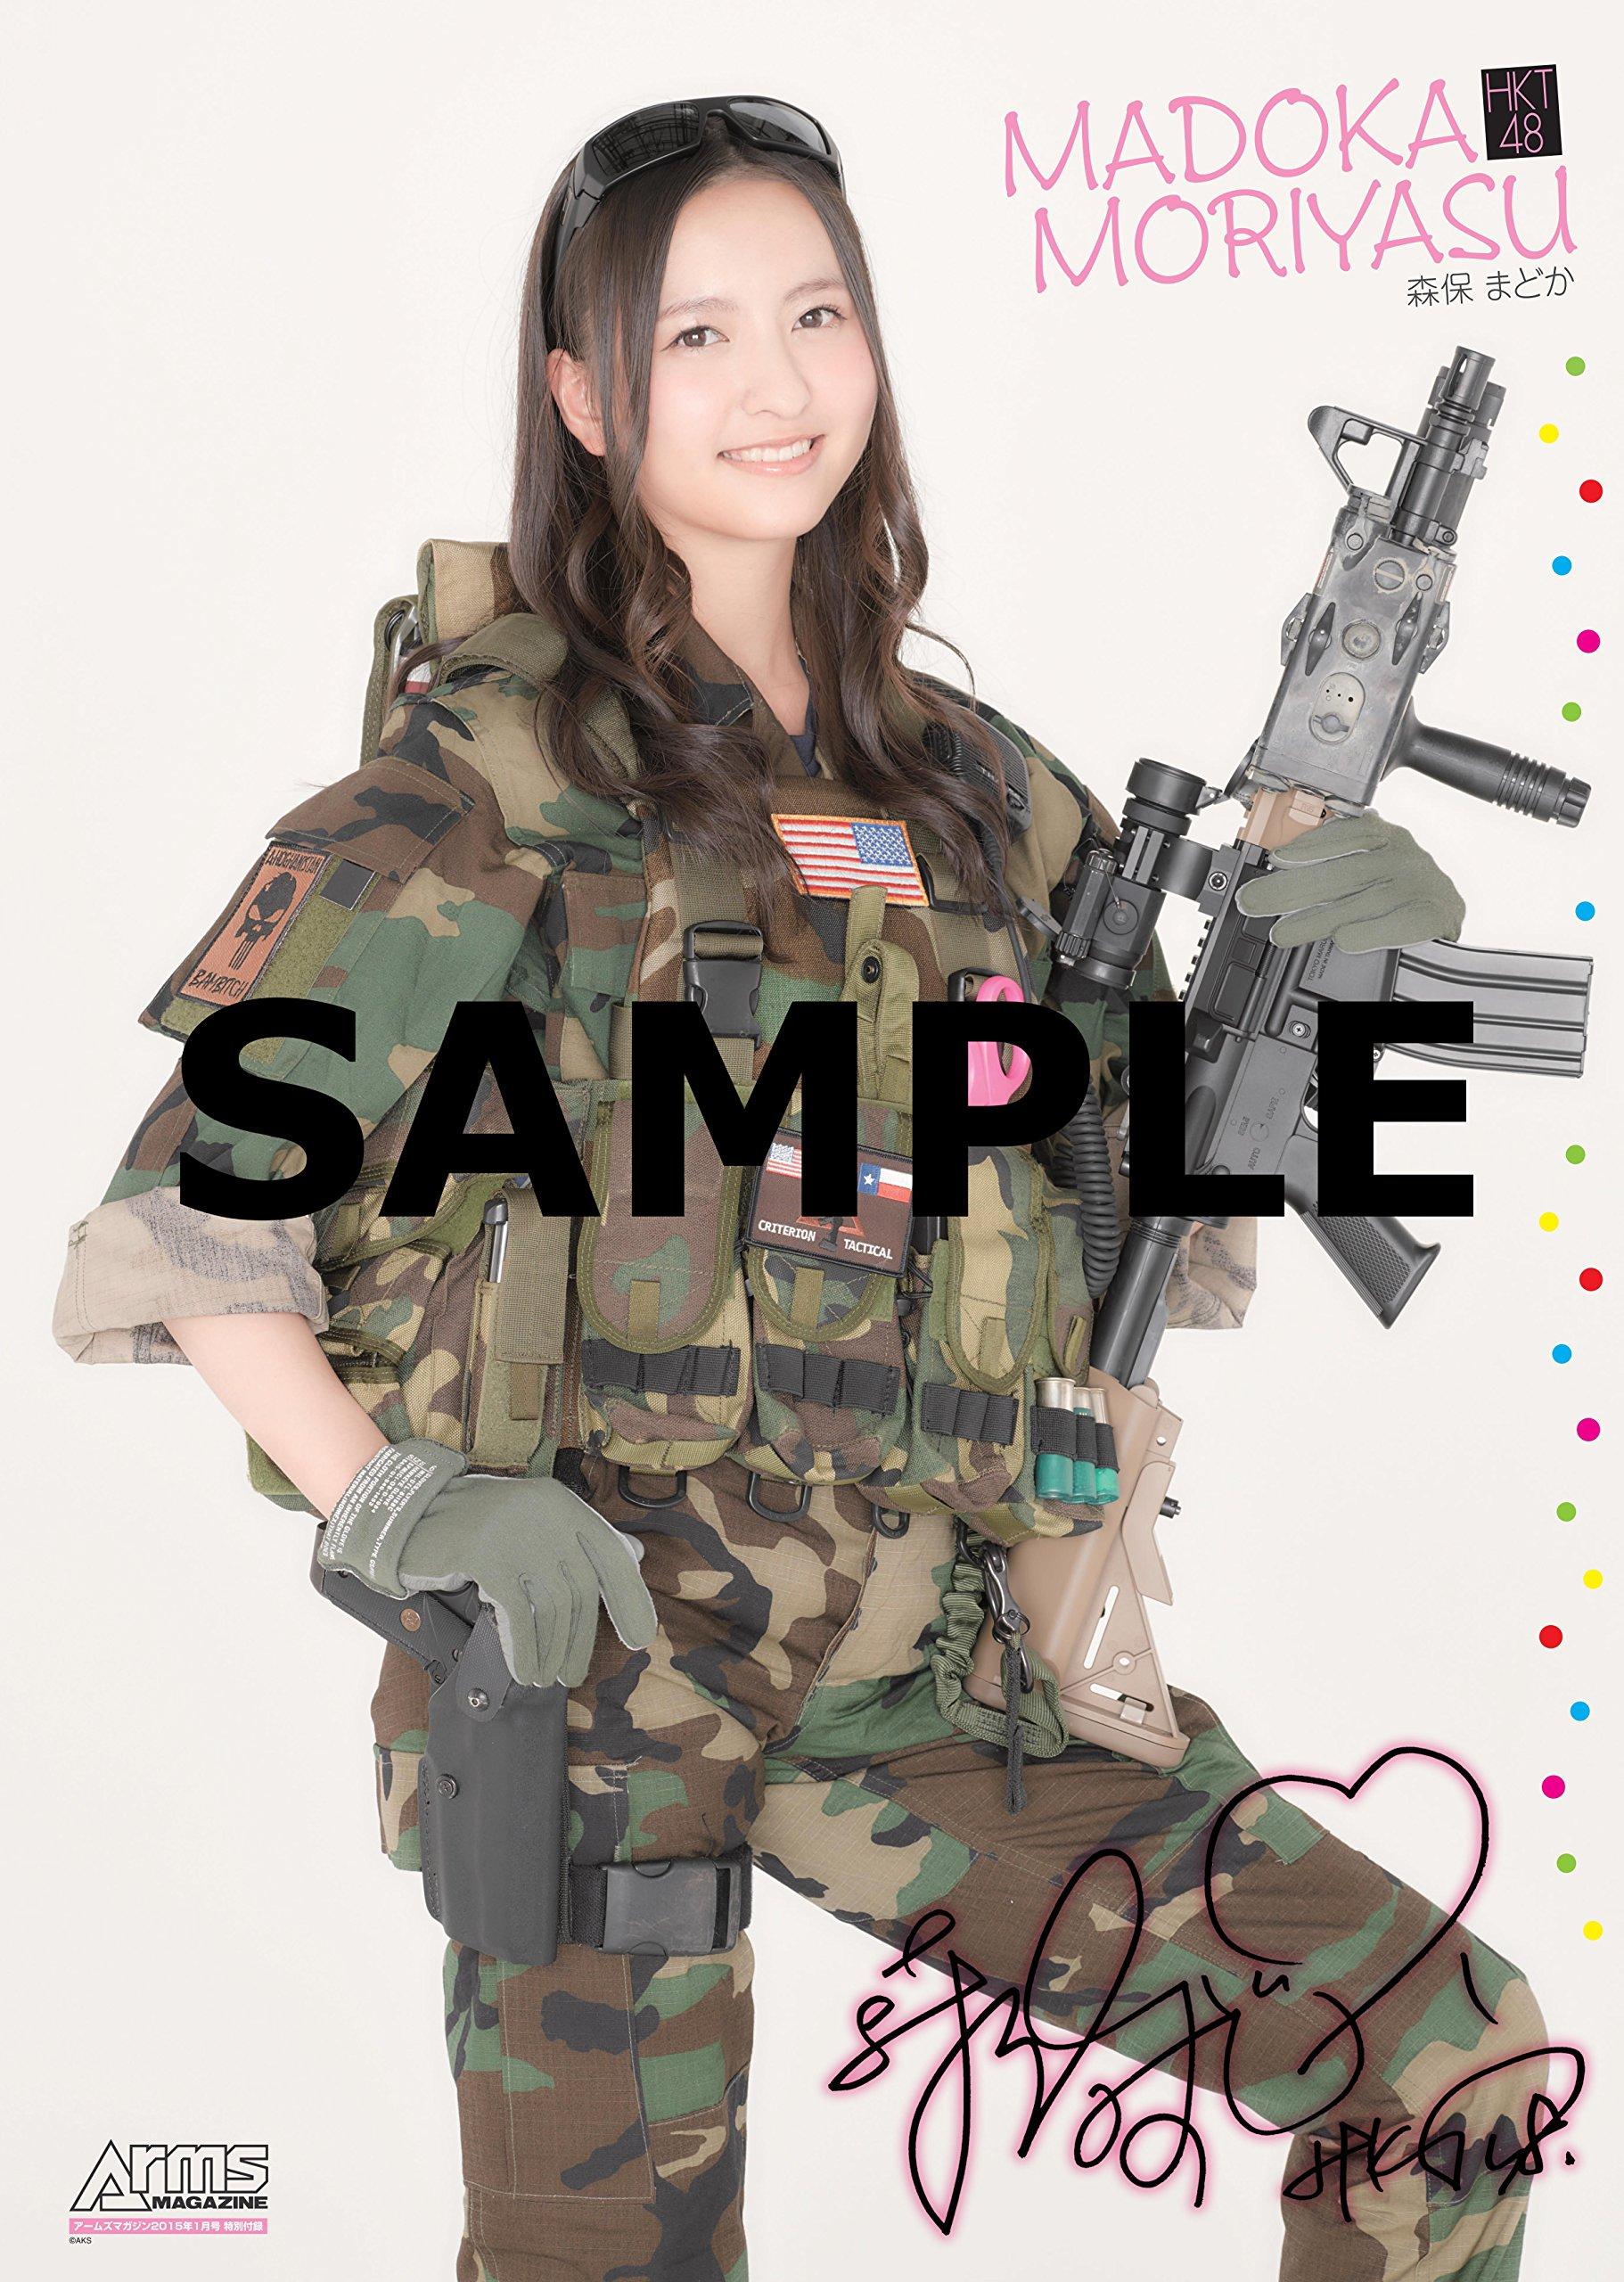 HKT48森保まどか&松岡菜摘 表紙 月刊Arms MAGAZINEアームズマガジン 2015年1月号  (1)